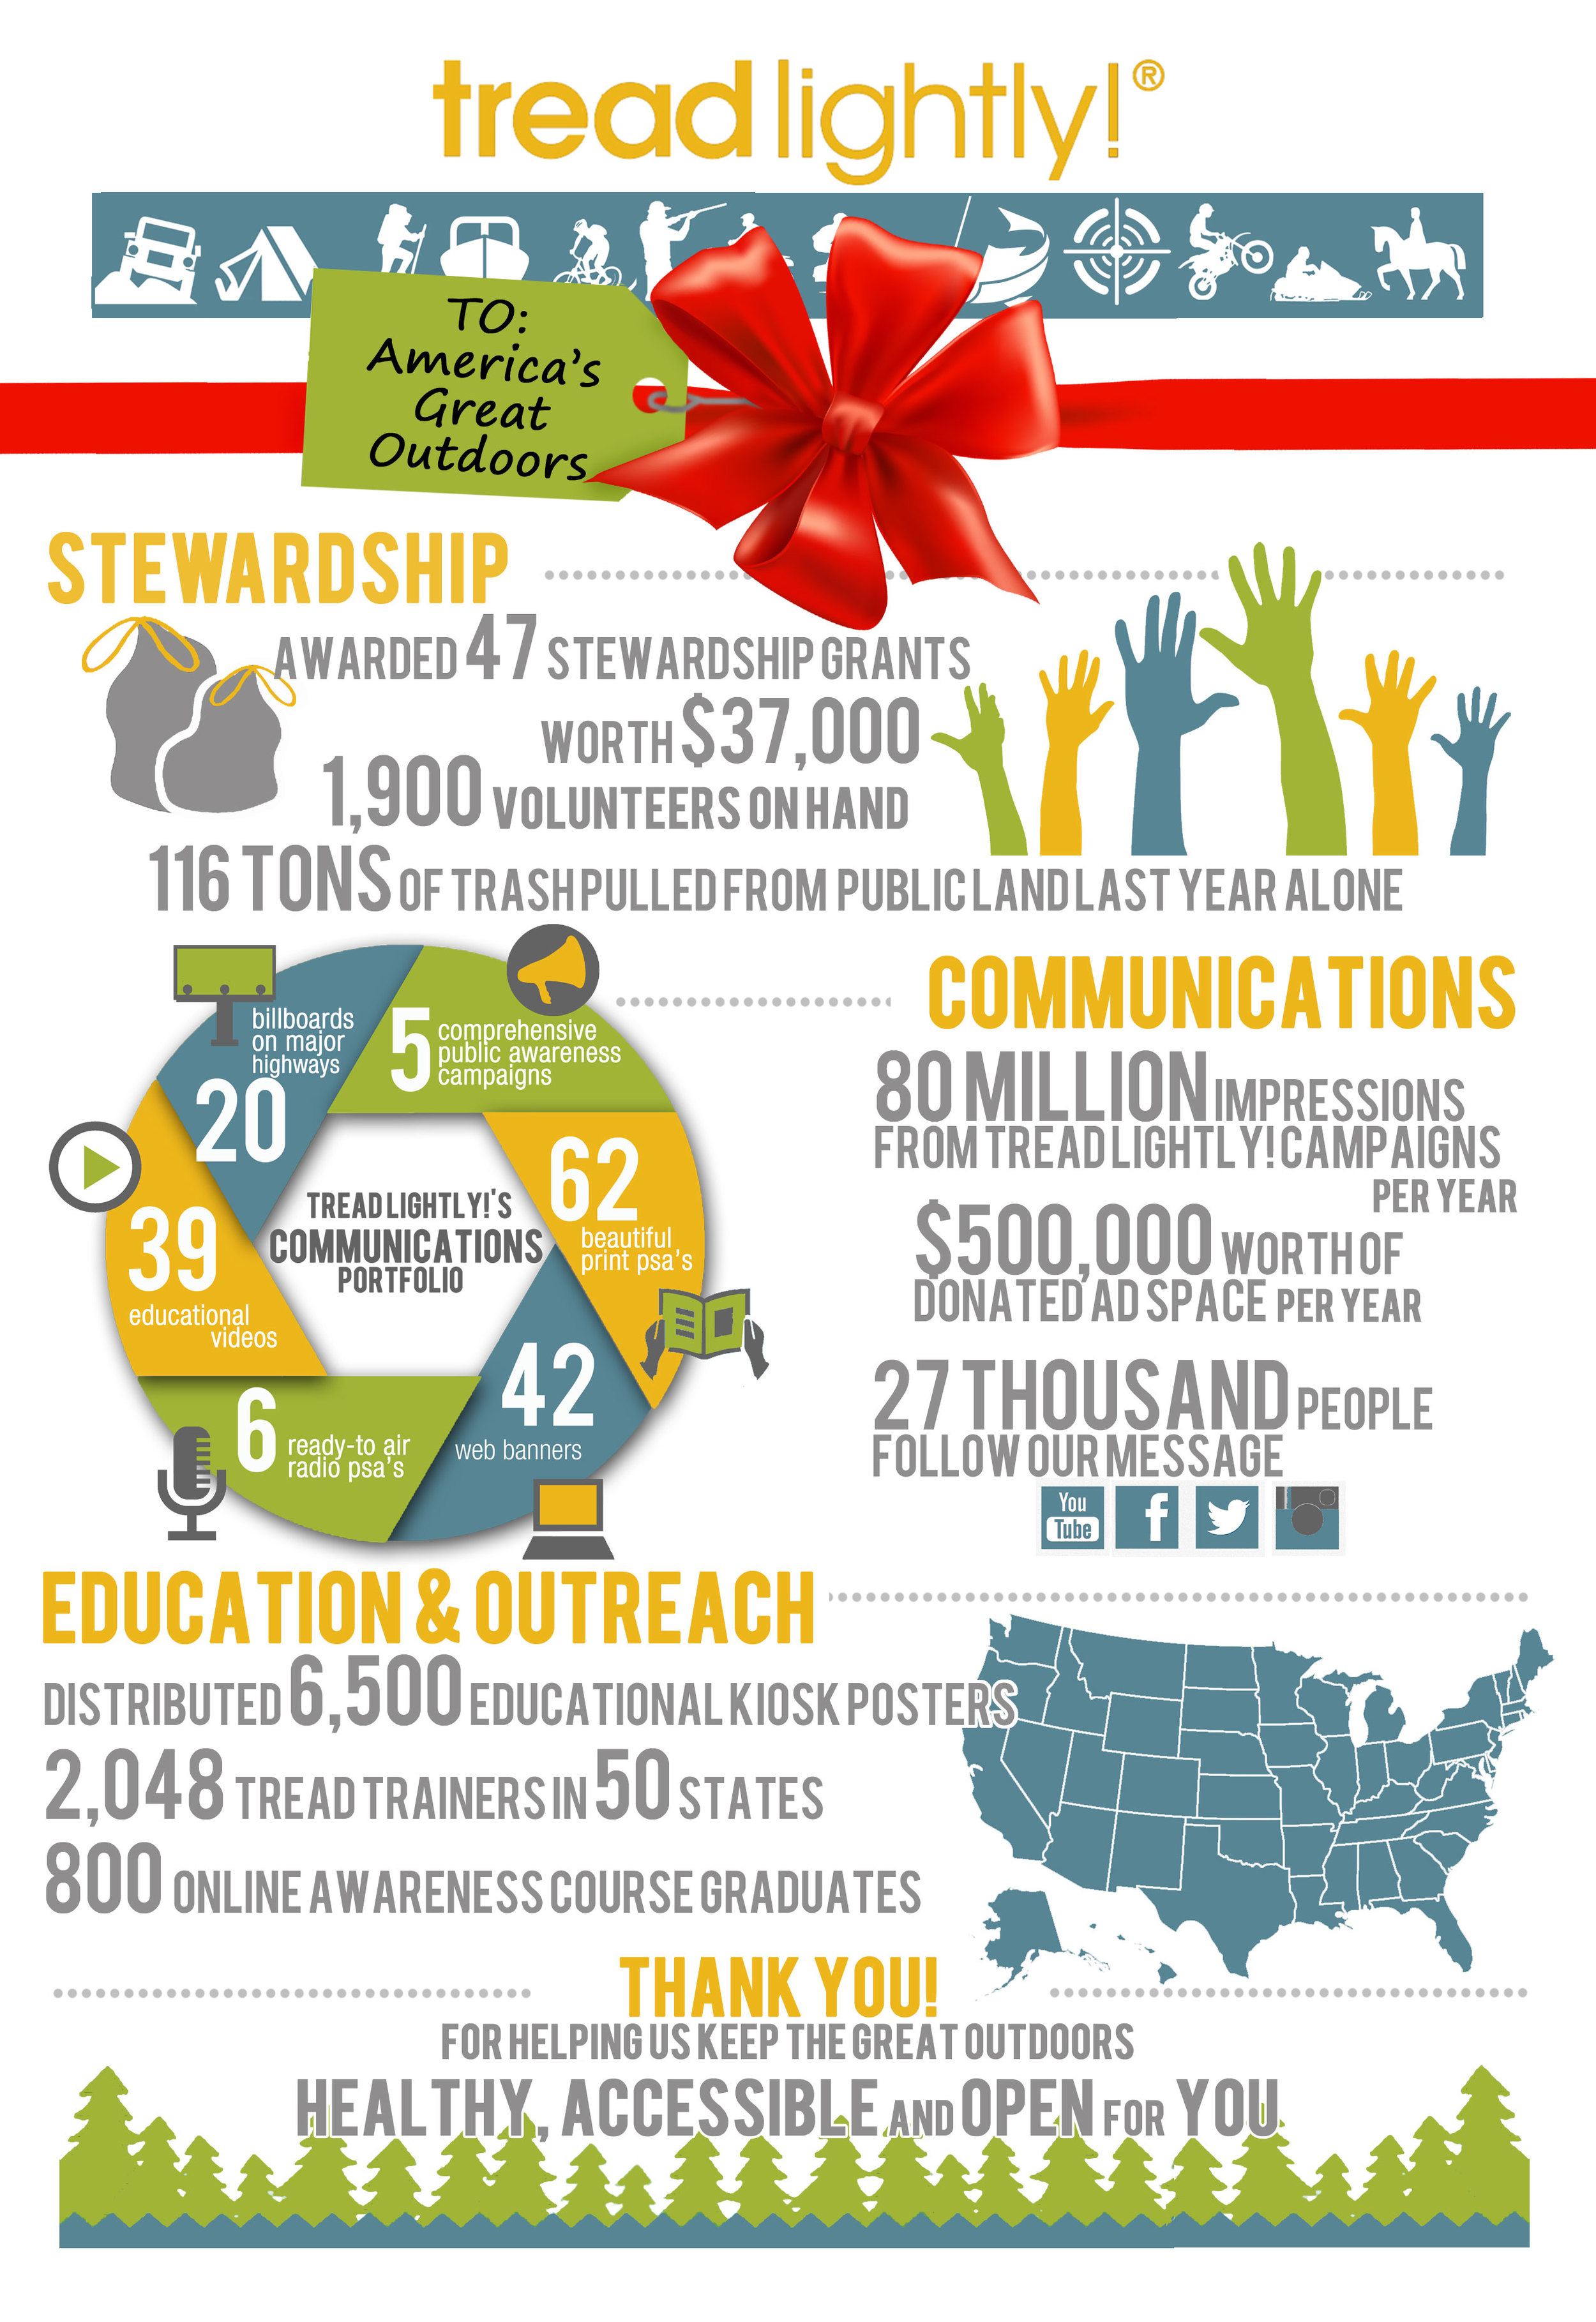 ChristmasTreadLightlyInfographic.jpg